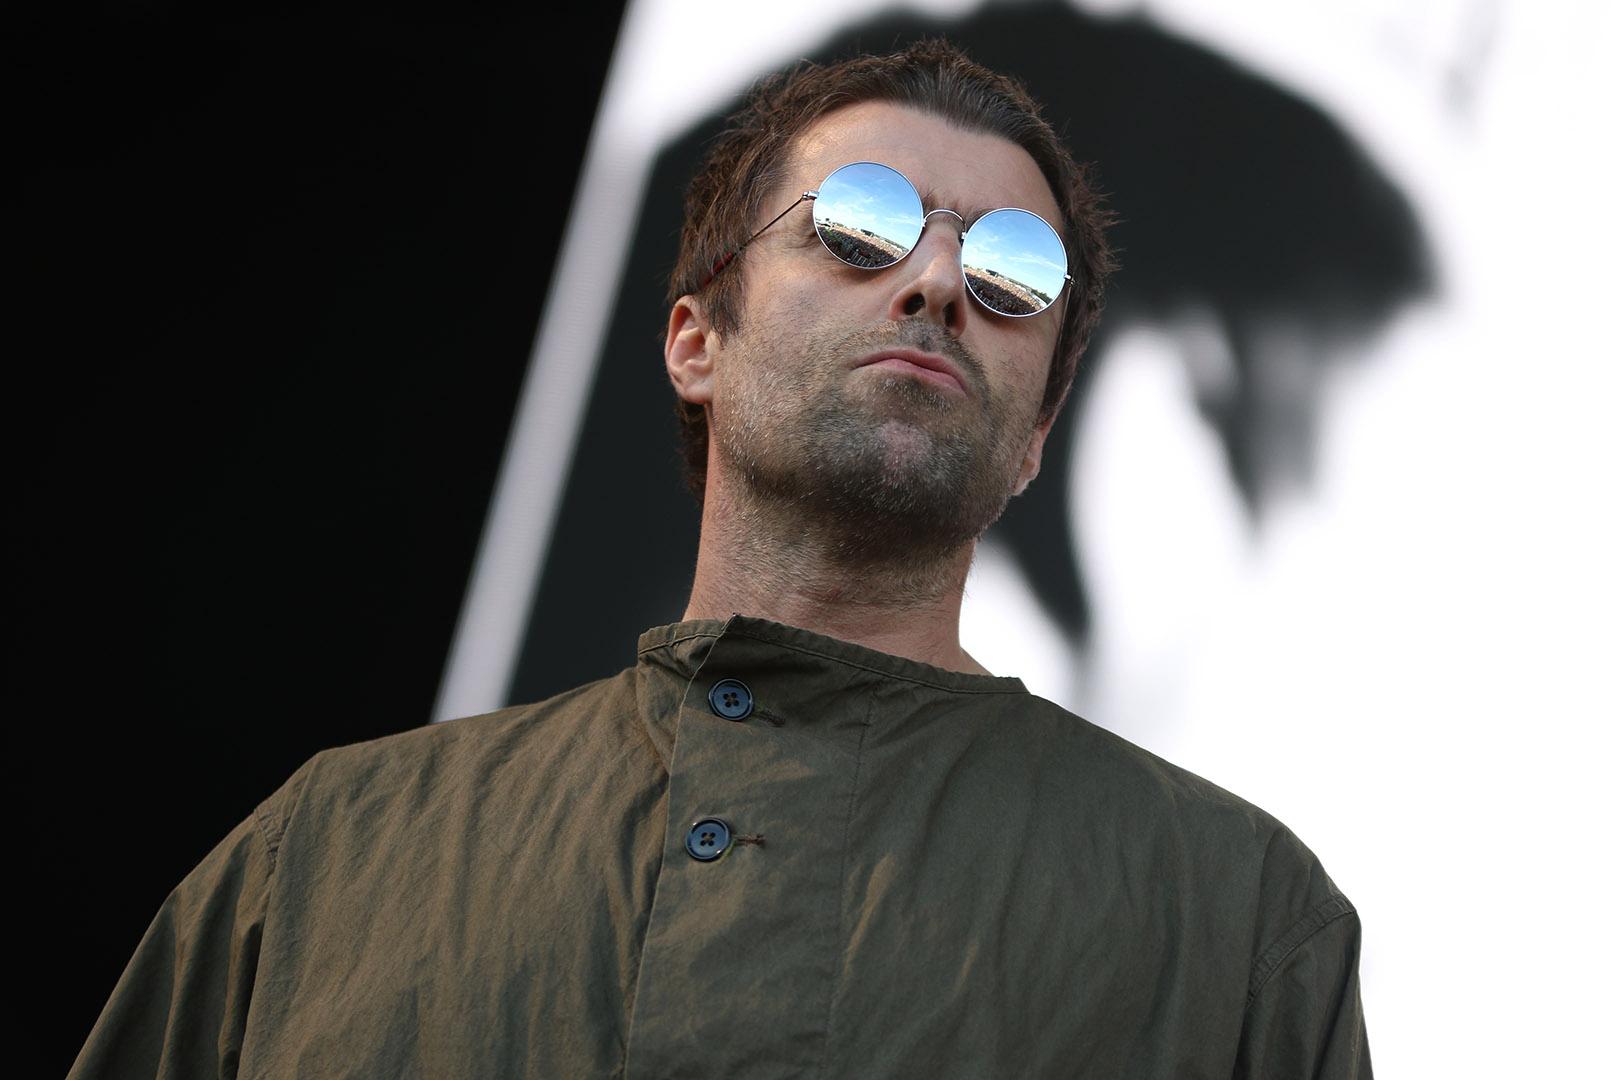 Liam Gallagher - Rodrigo Rivas Ruiz